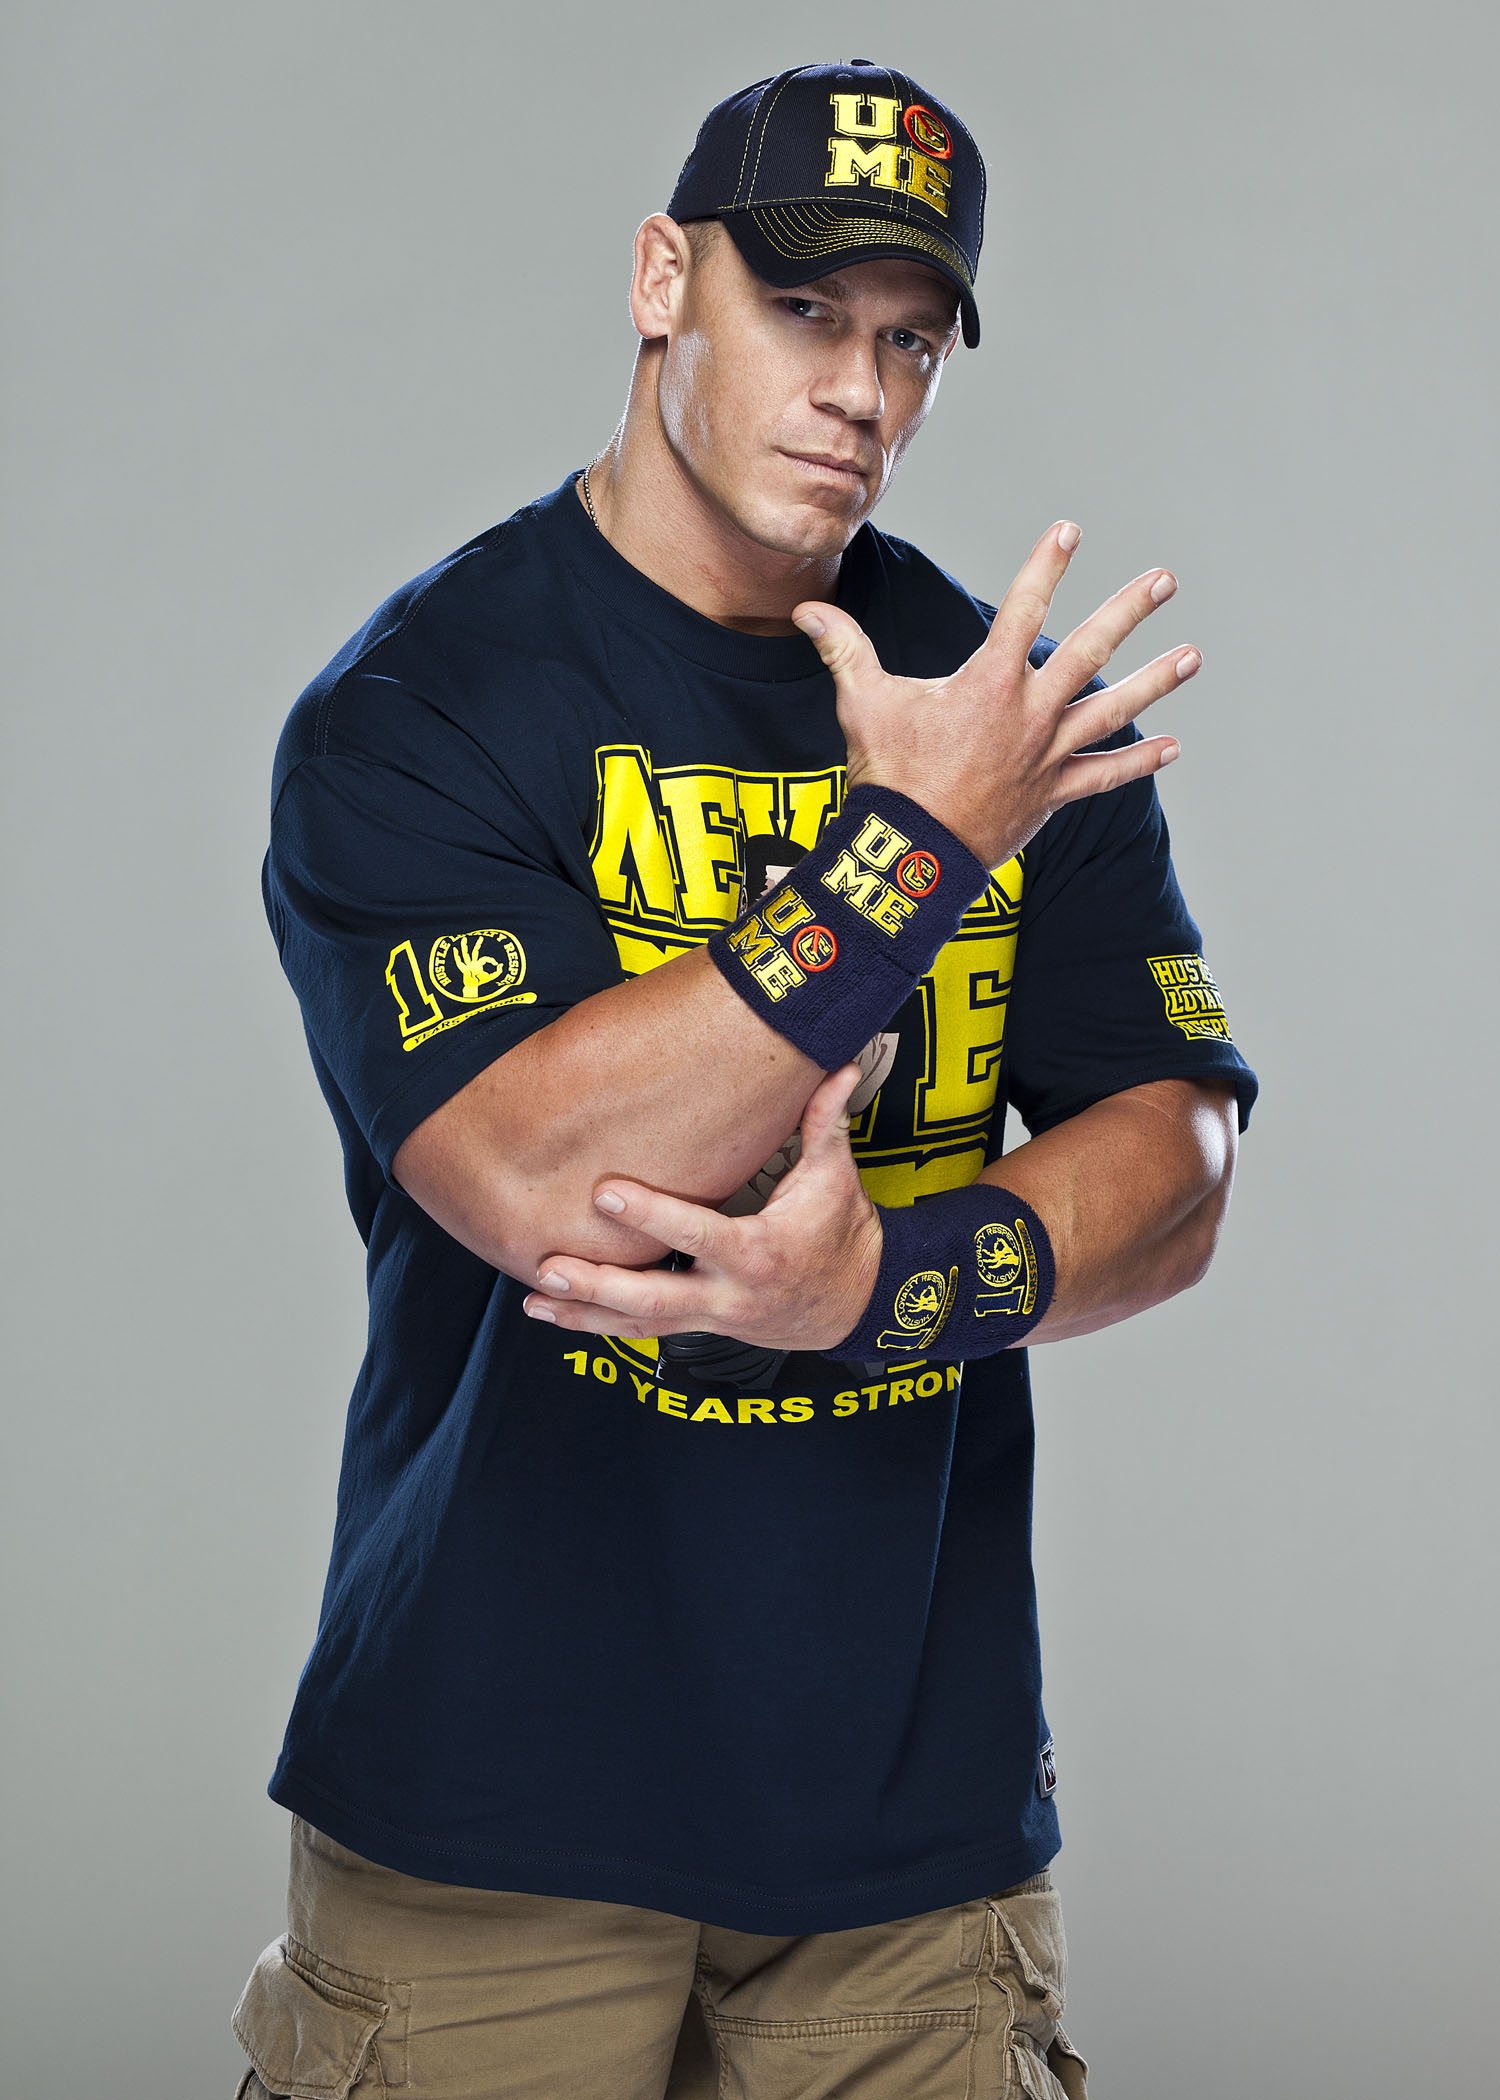 http://eclipsemagazine.com/wp-content/uploads/2013/11/WWE-John-Cena-2013.jpg